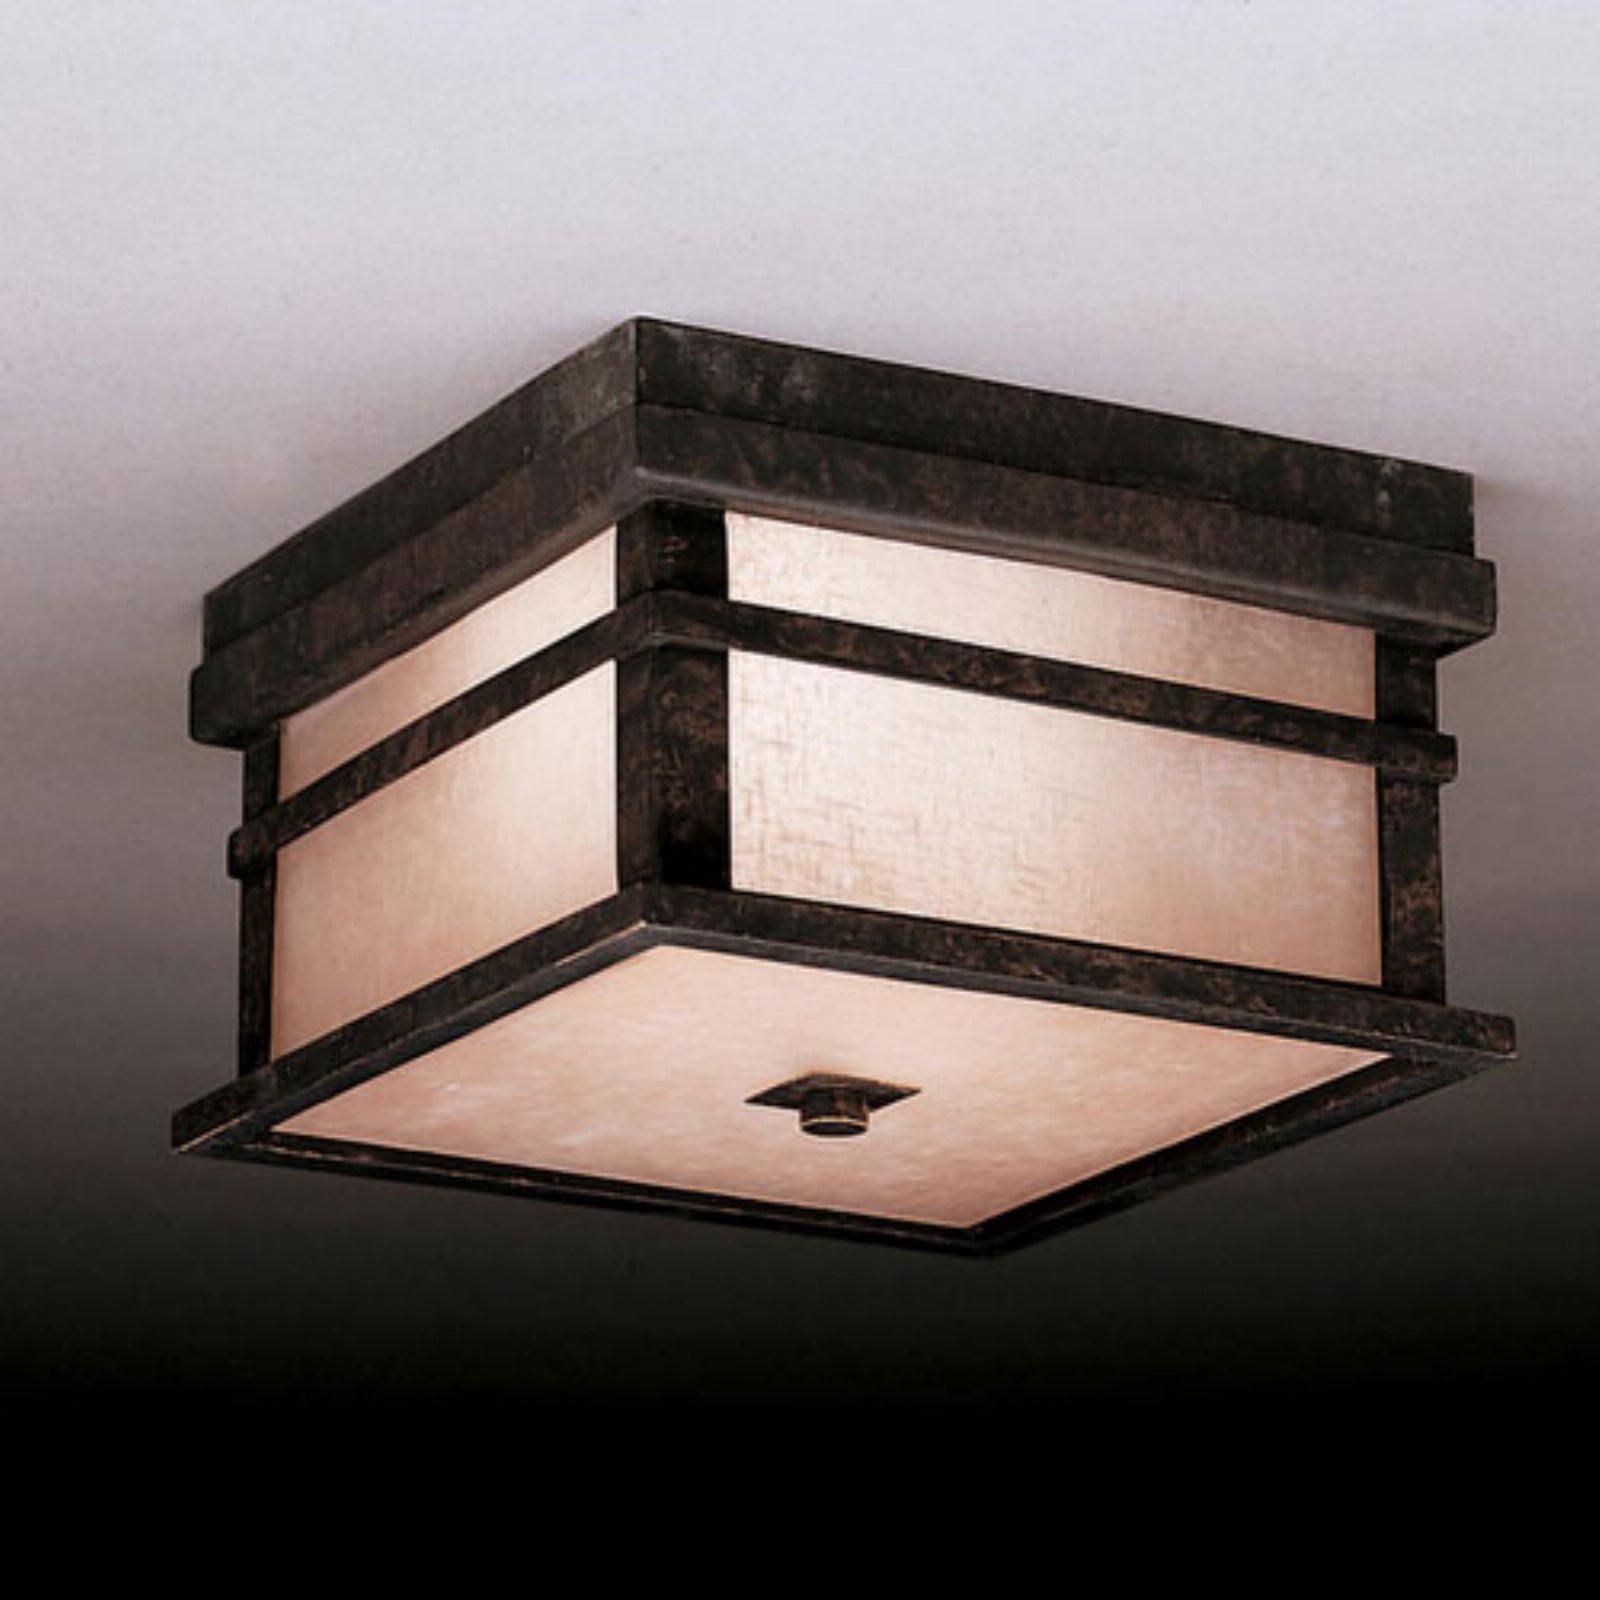 Kichler Cross Creek Outdoor Ceiling Light - 5.5H in. Aged Bronze